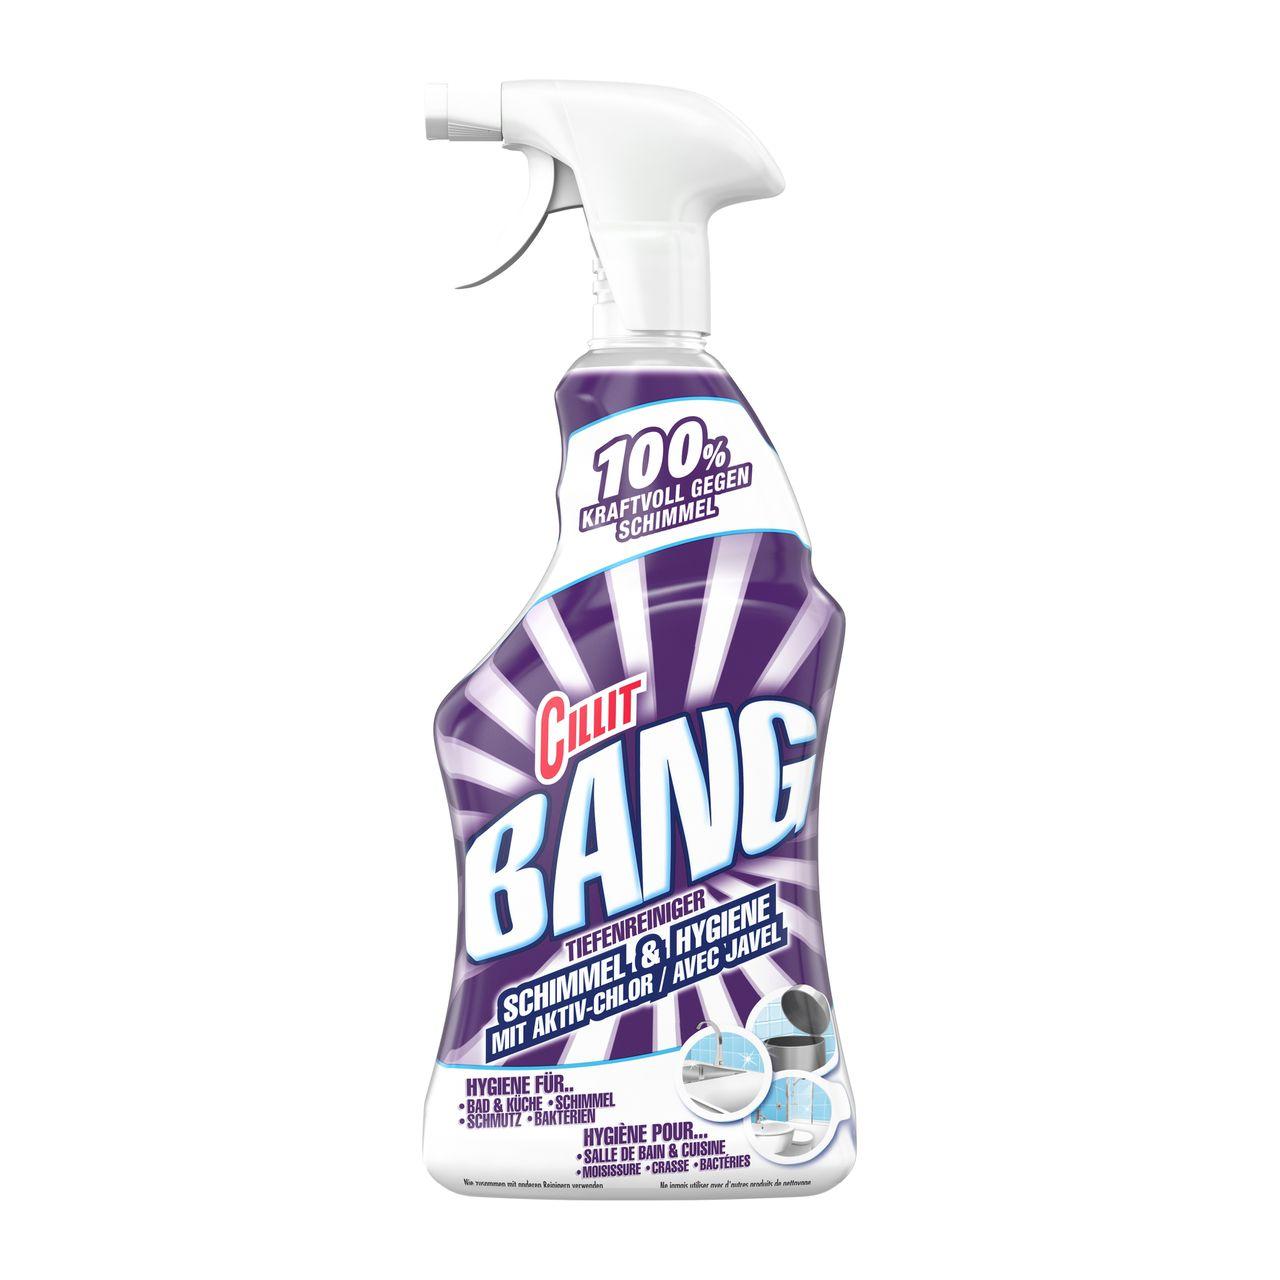 Cillit Bang Schimmel Hygiene 750 Ml